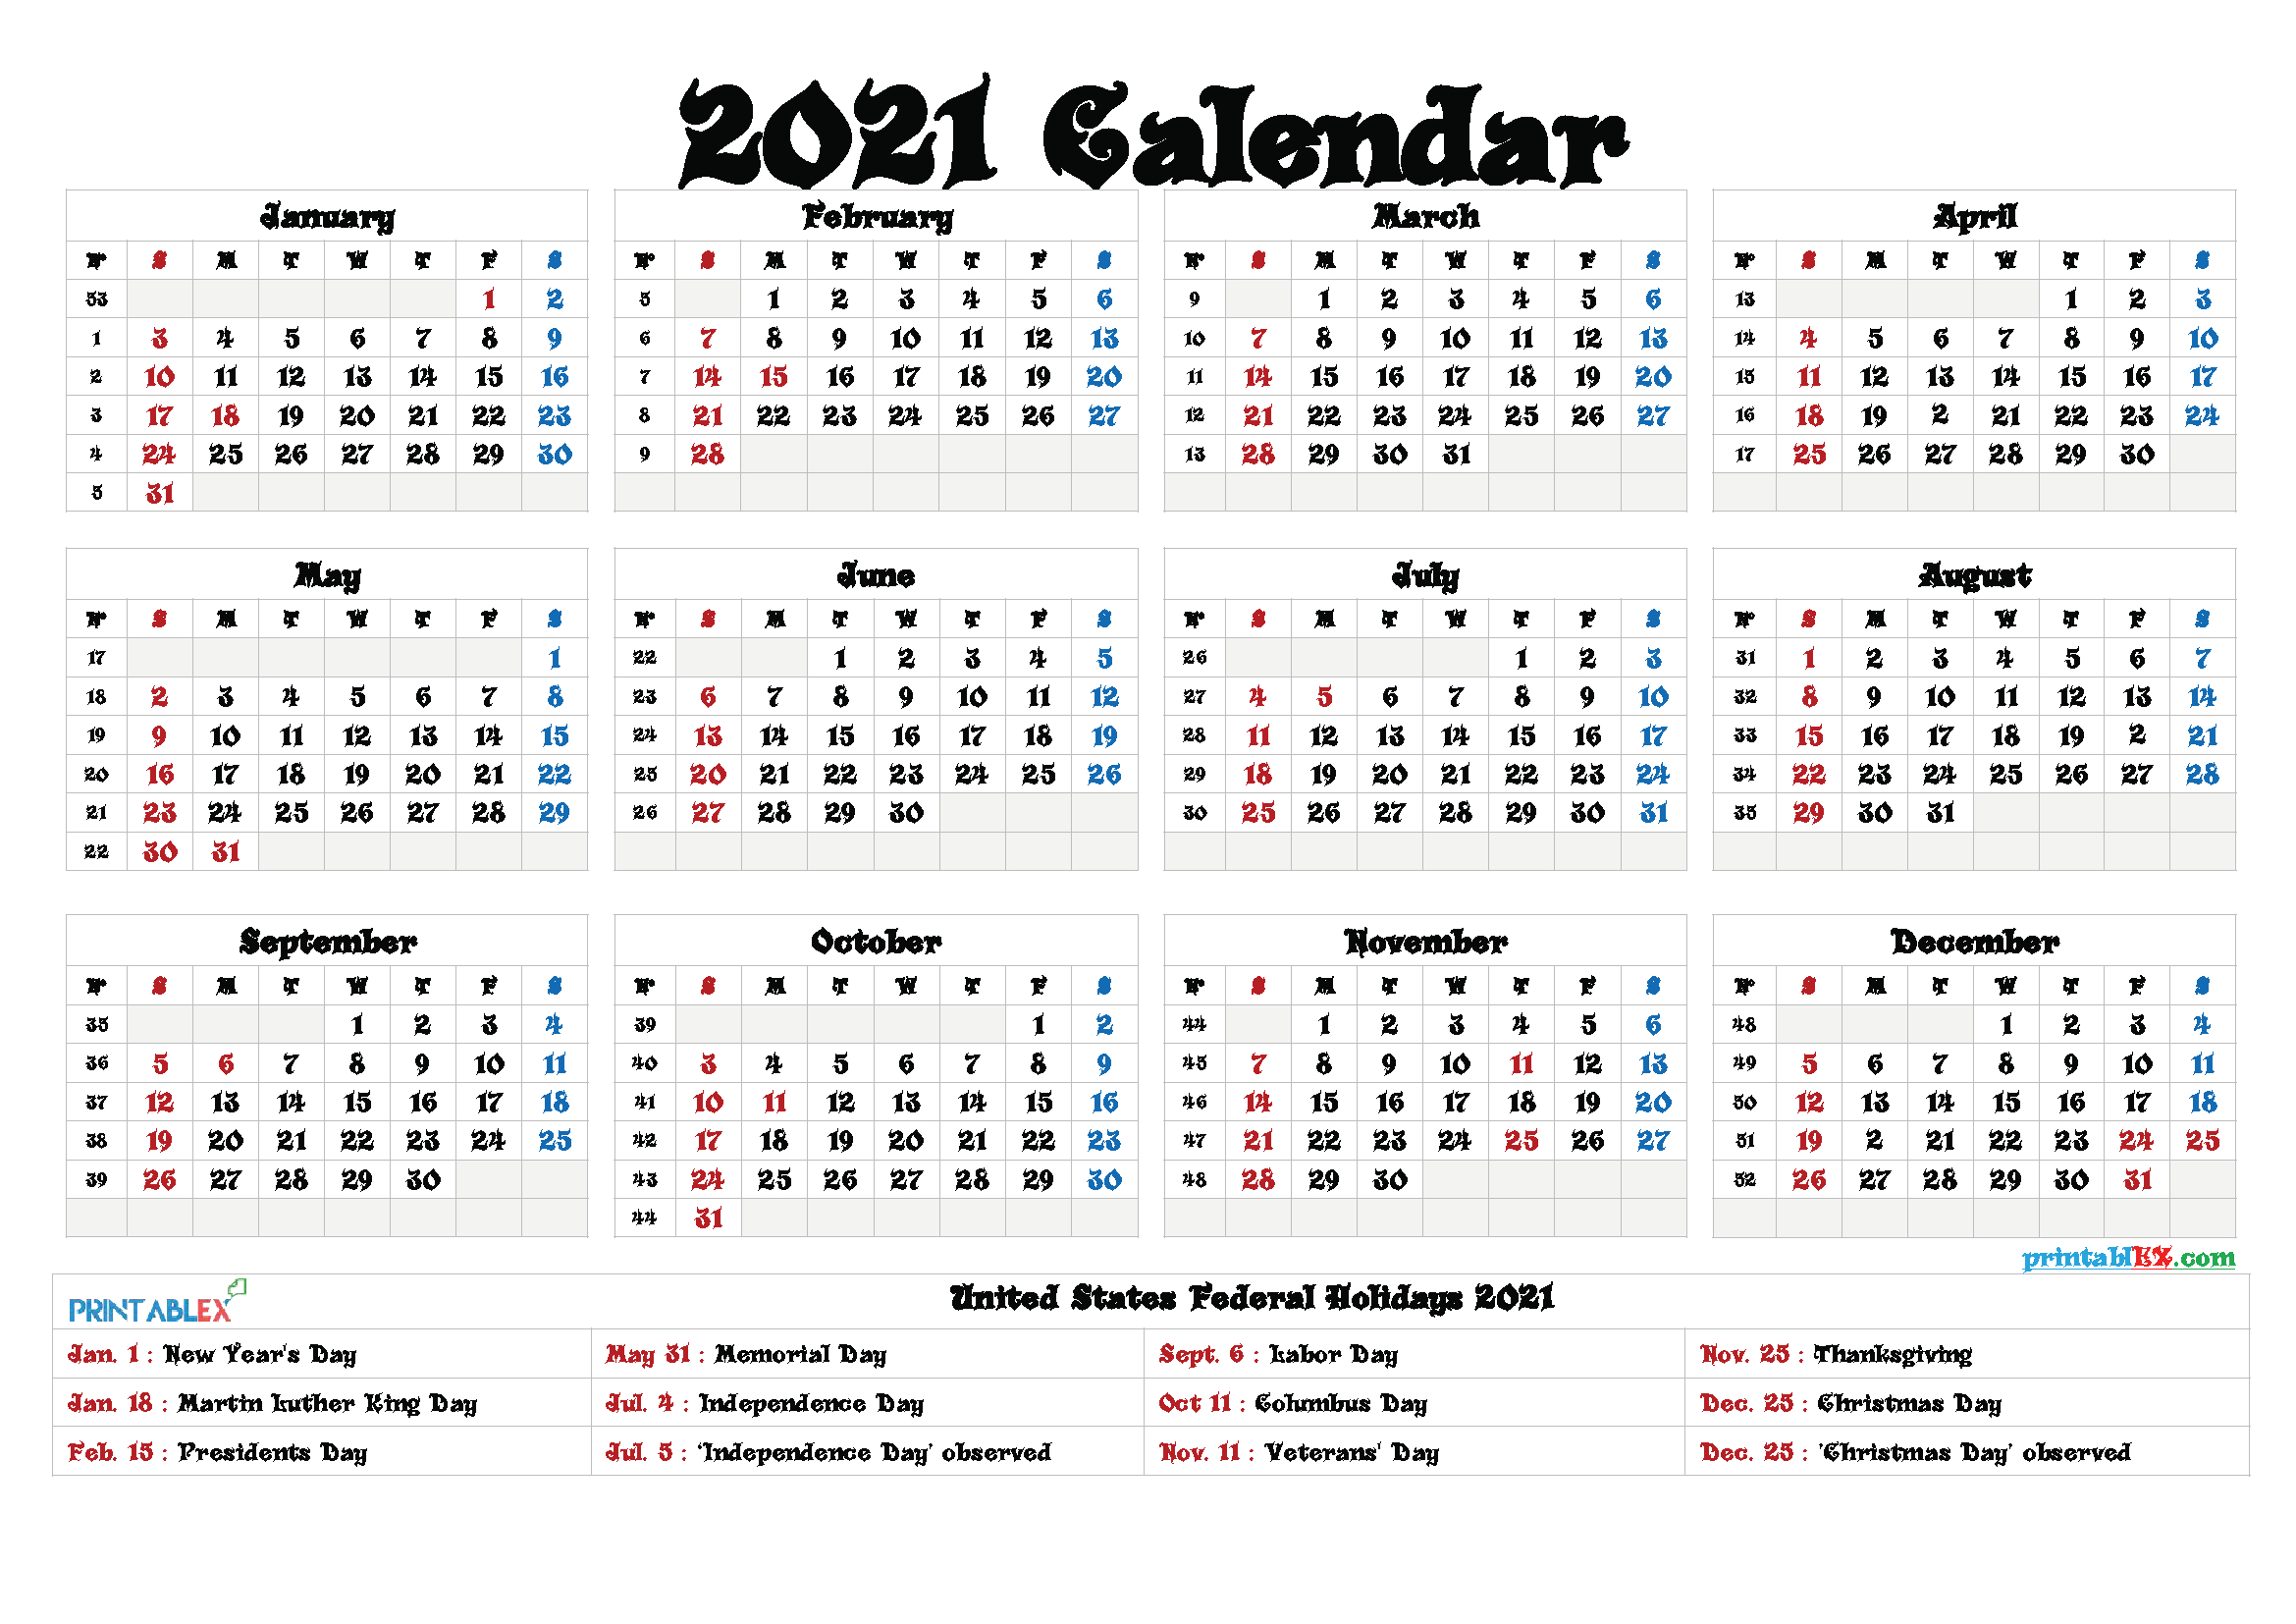 Stock Market Calendar 2021 | Calendar Page  Financial Year Dates 2021 2021